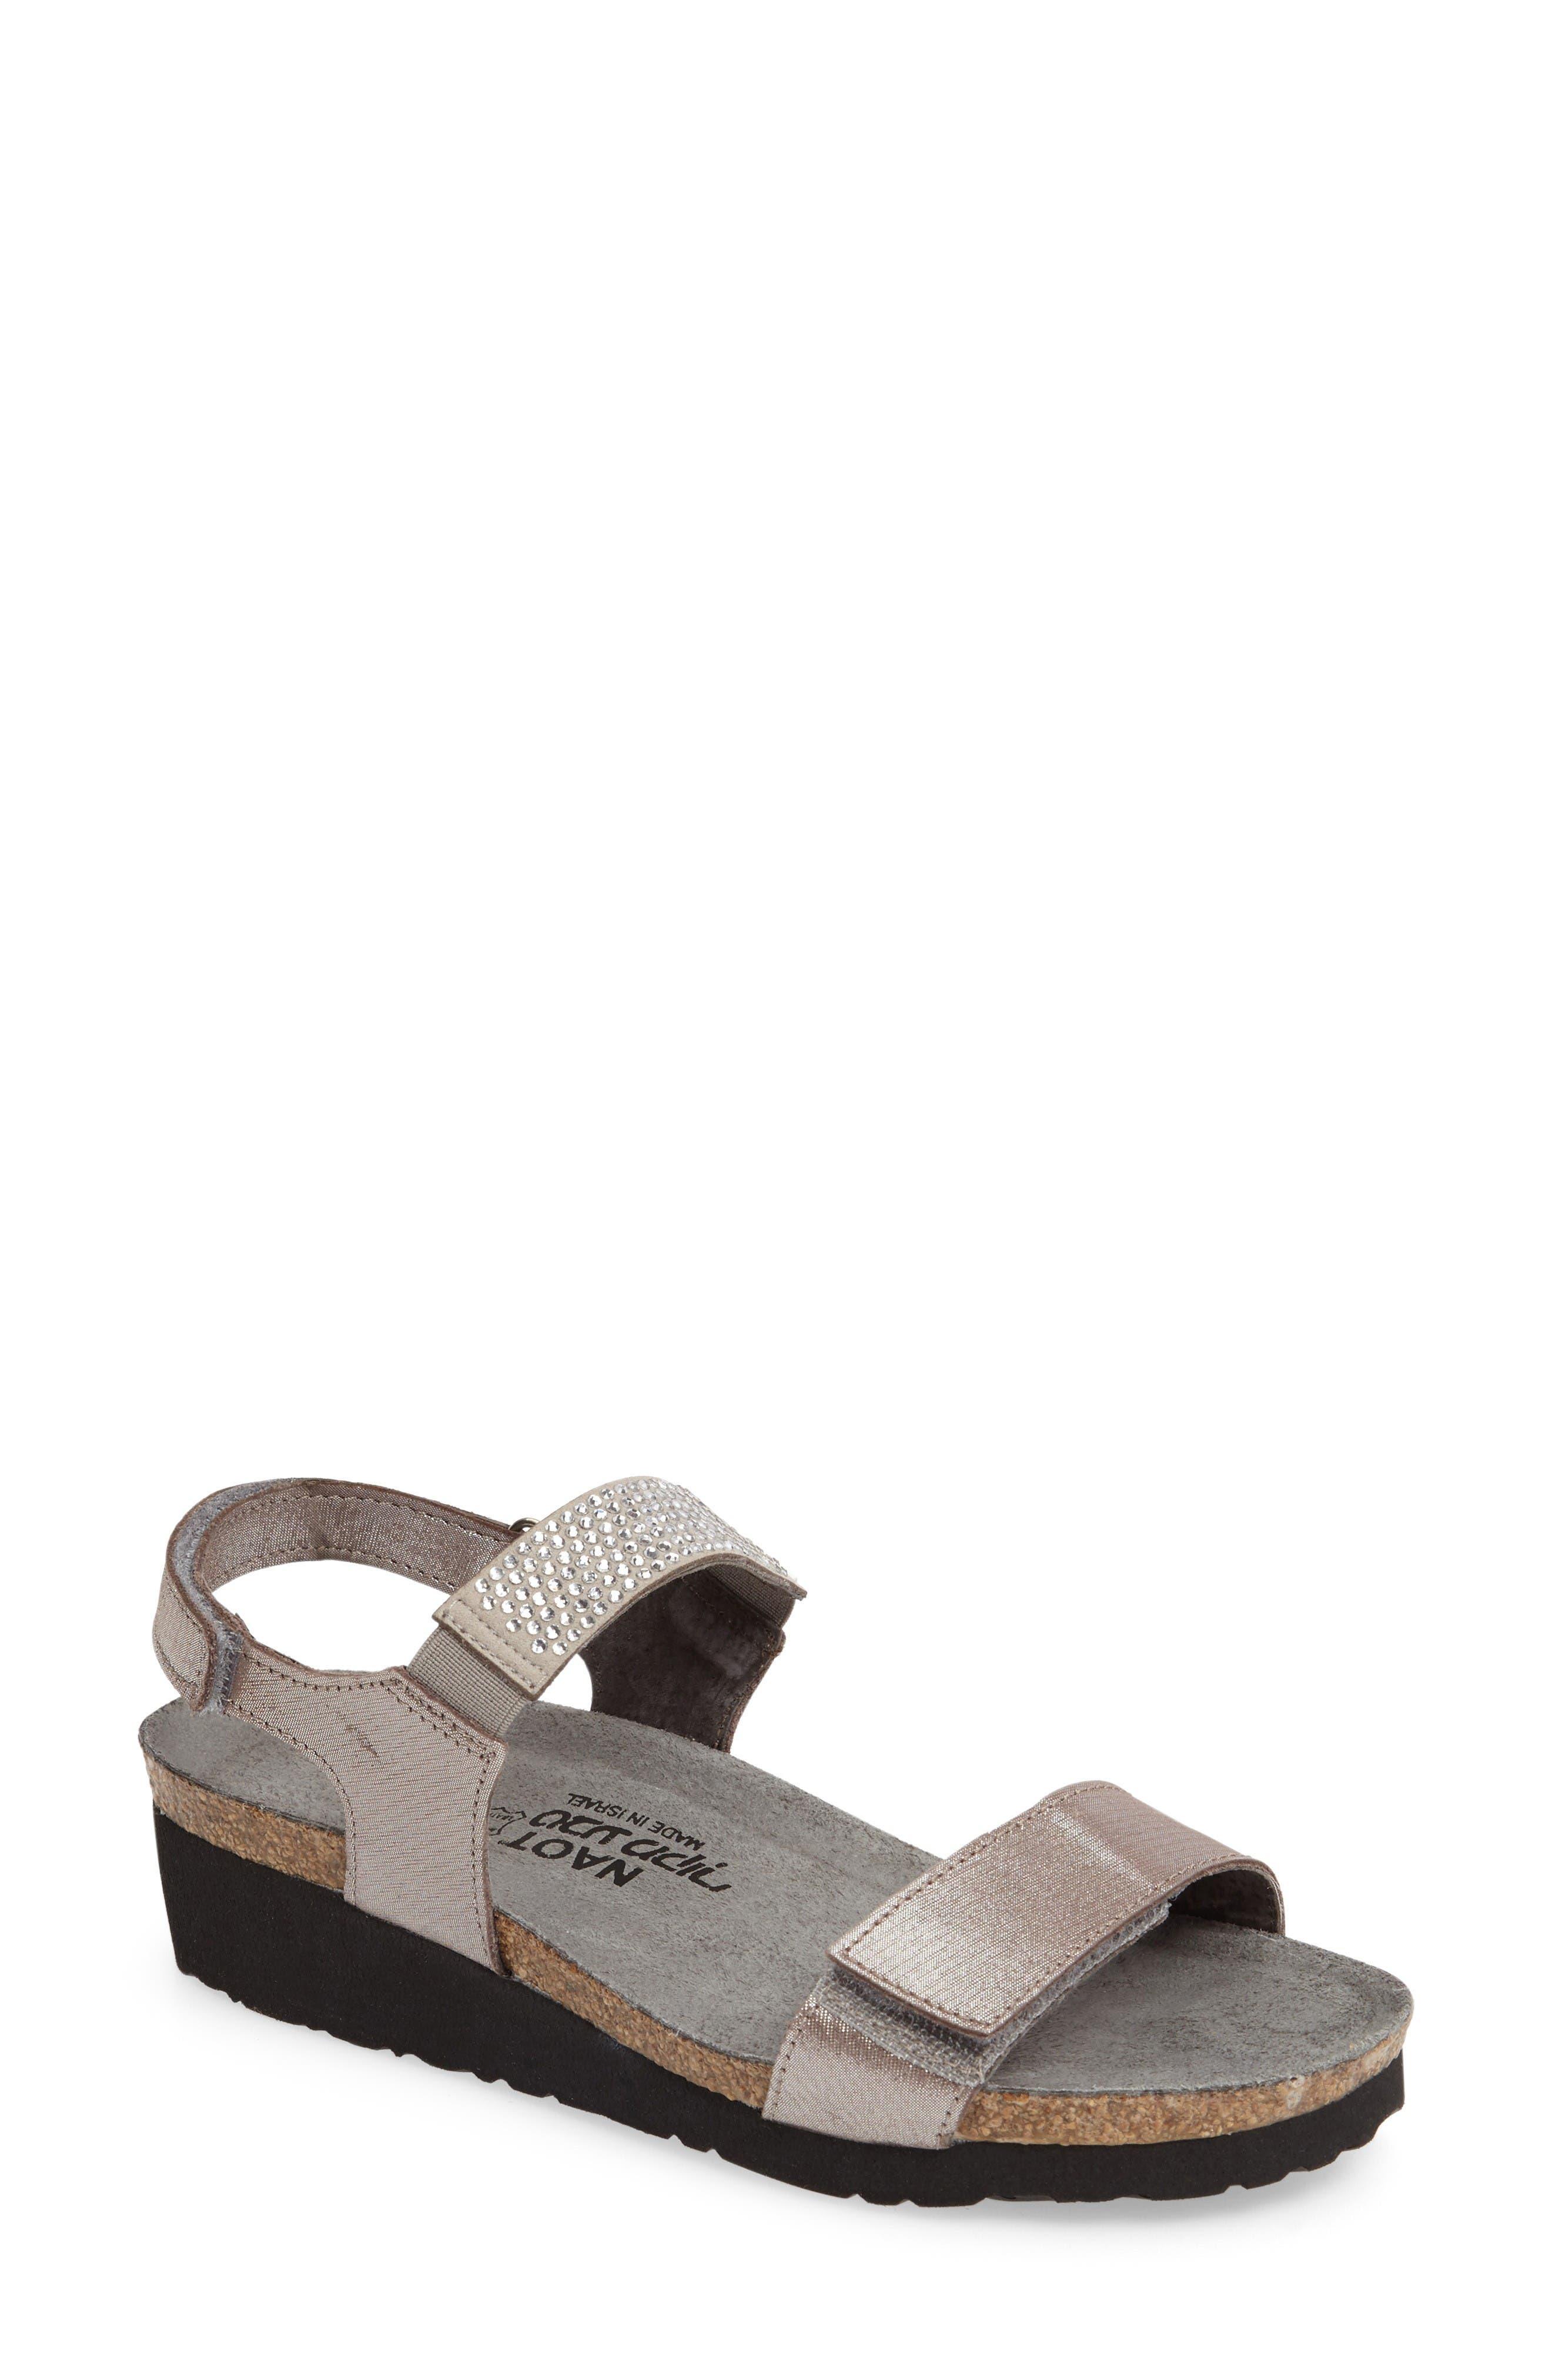 NAOT 'Lisa' Crystal Embellished Sandal